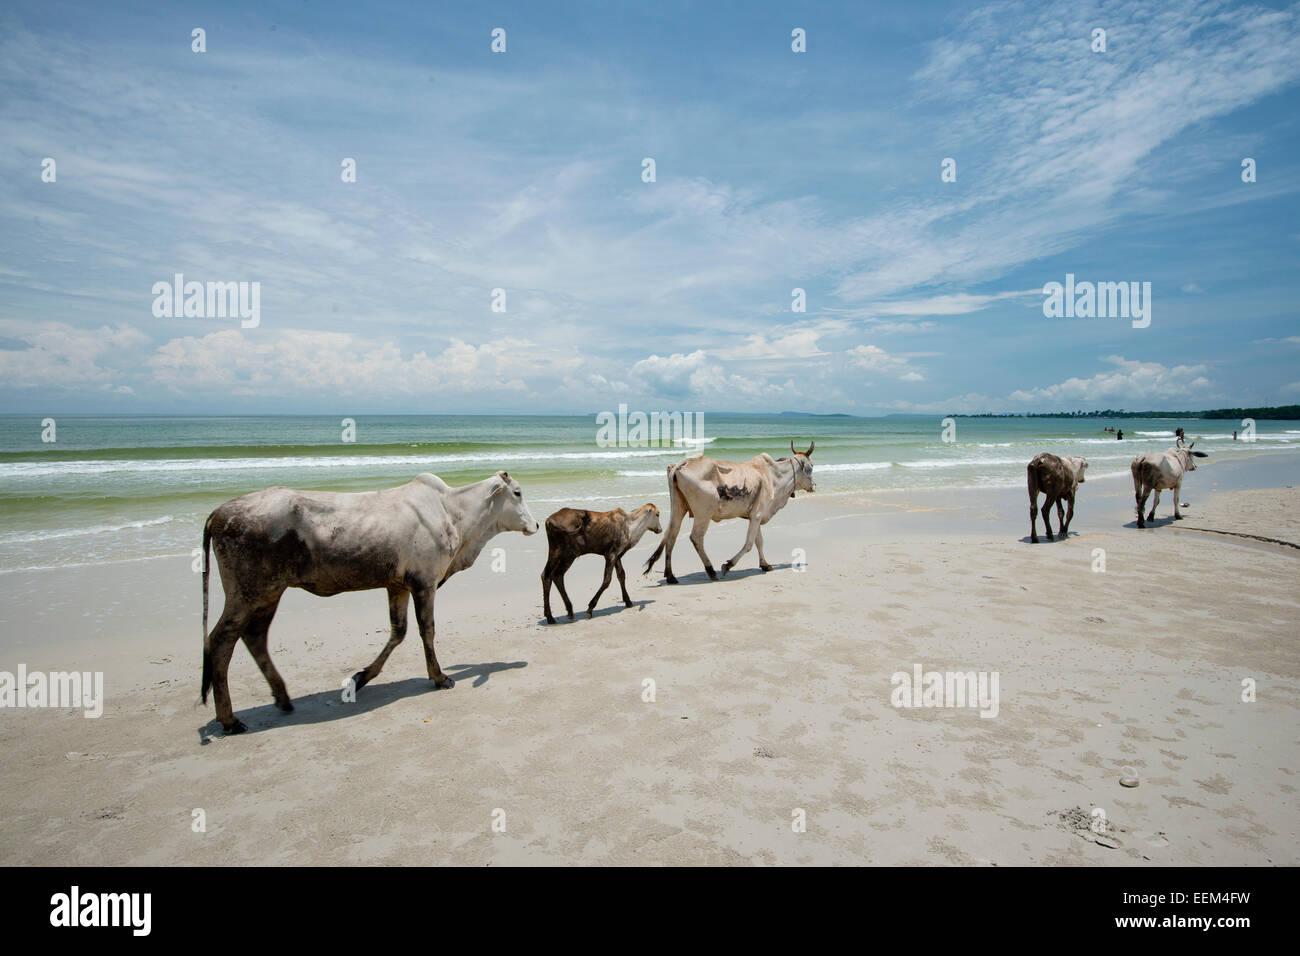 Cows walking on the beach, Otres Beach, Sihanoukville, Preah Sihanuk, Cambodia - Stock Image